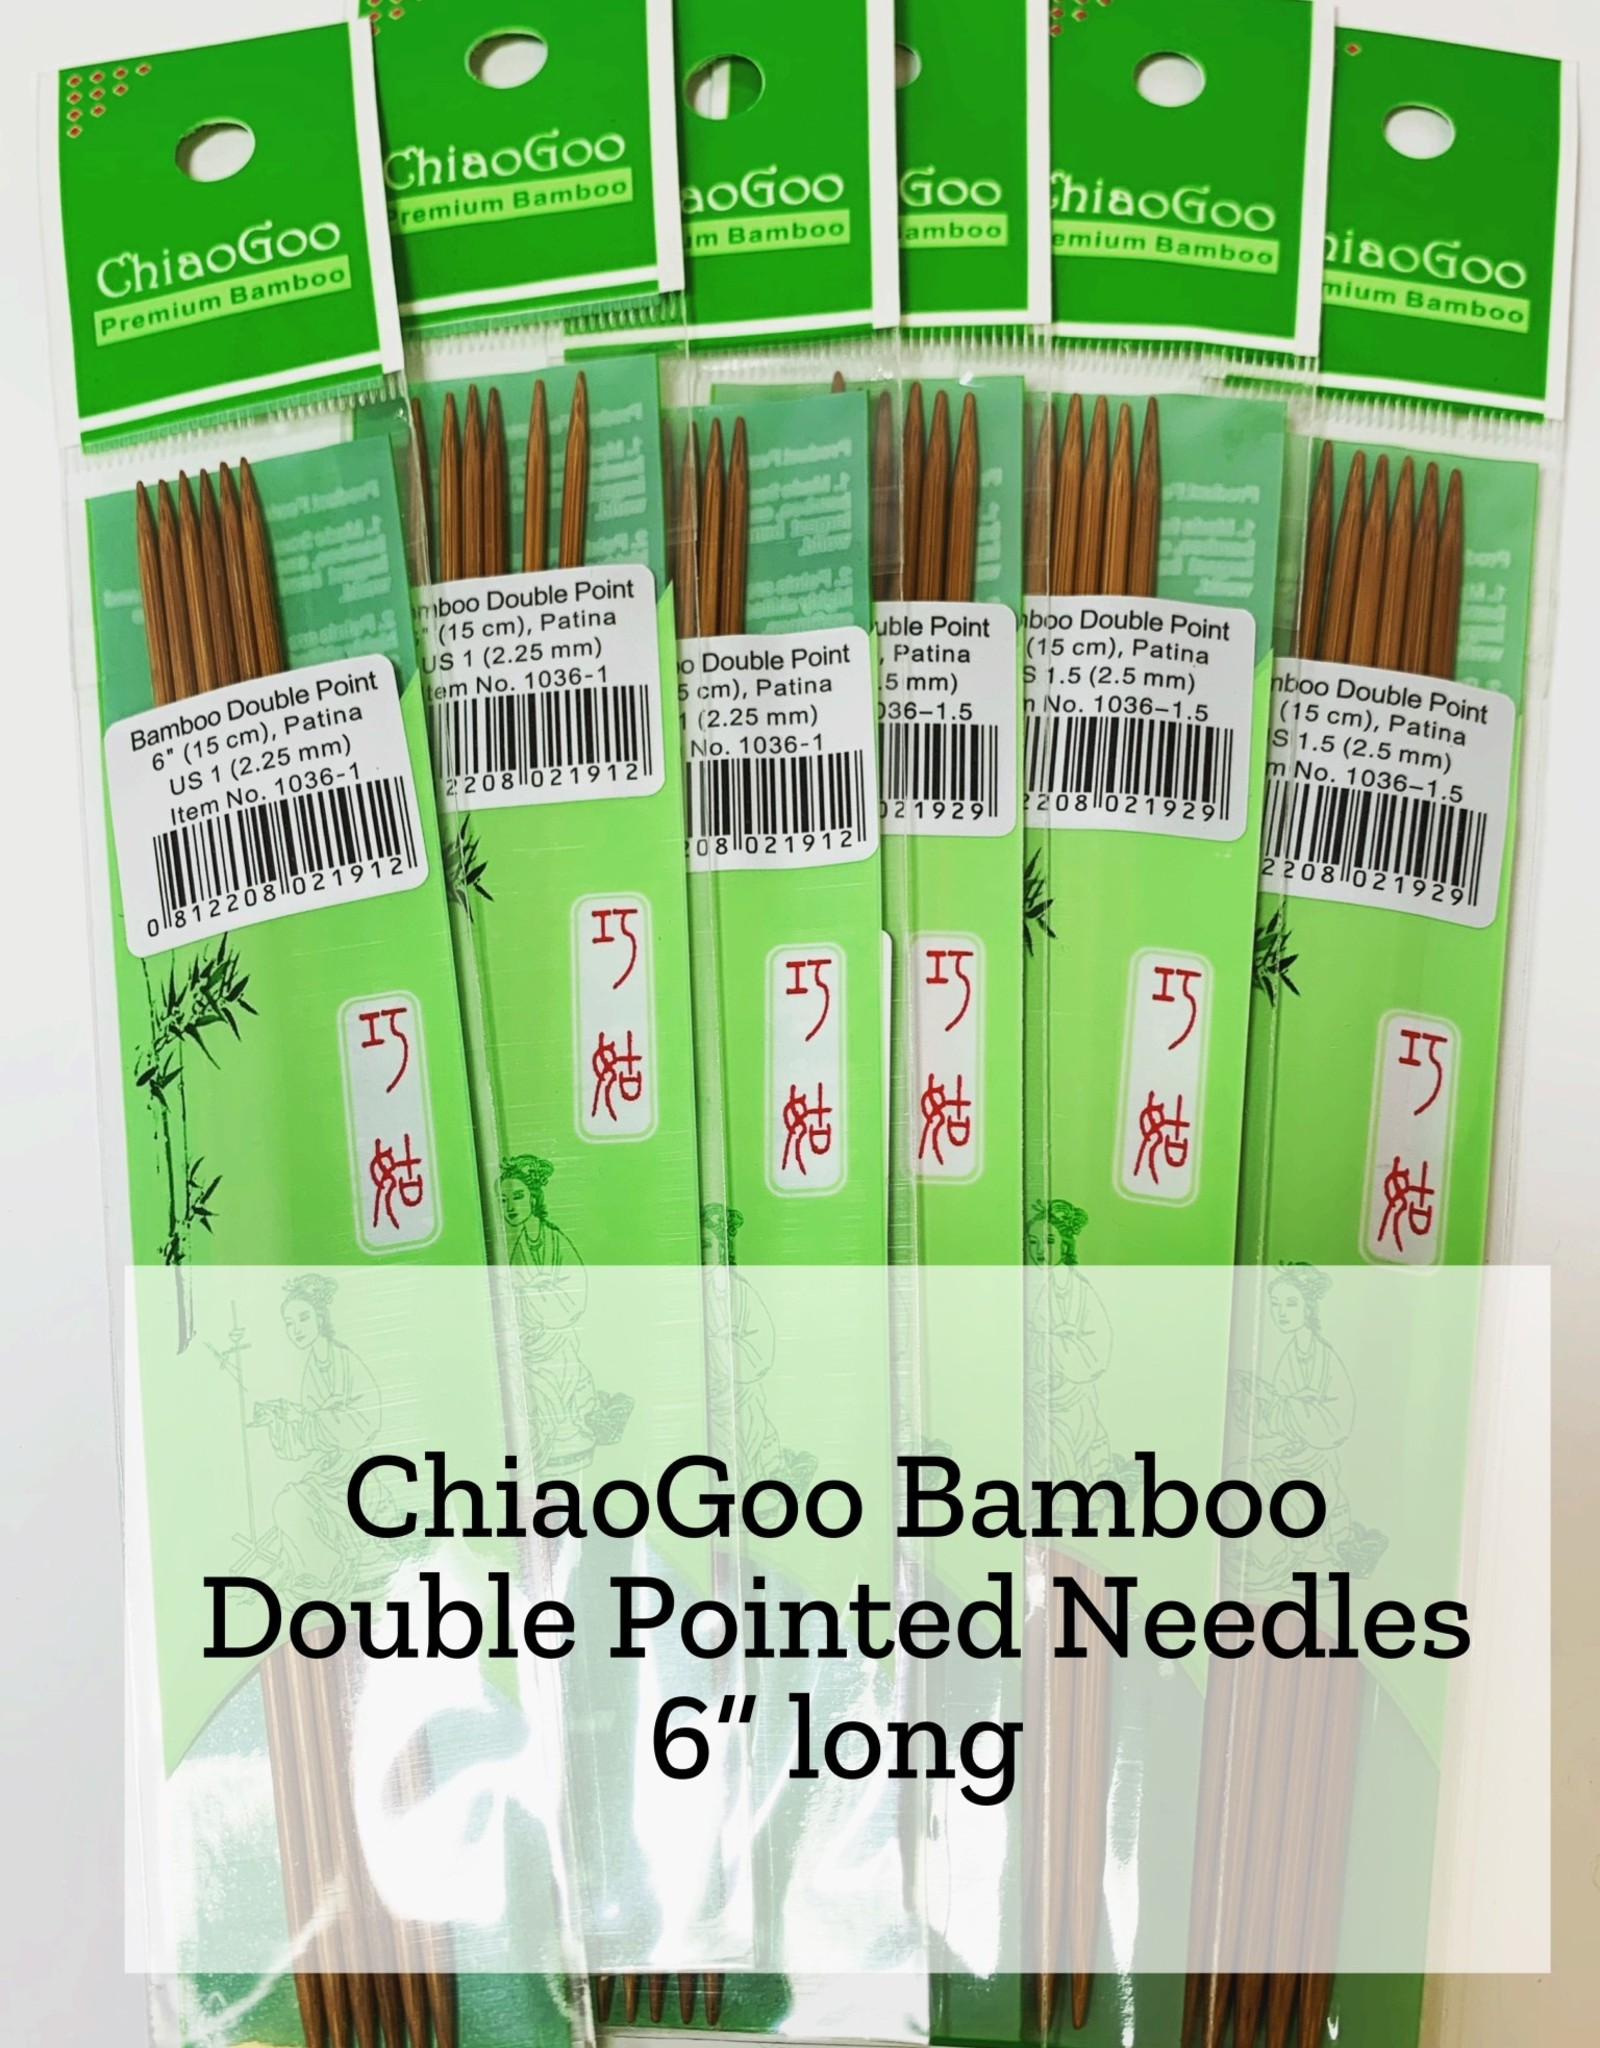 ChiaoGoo Bamboo DPN - 3.5 mm